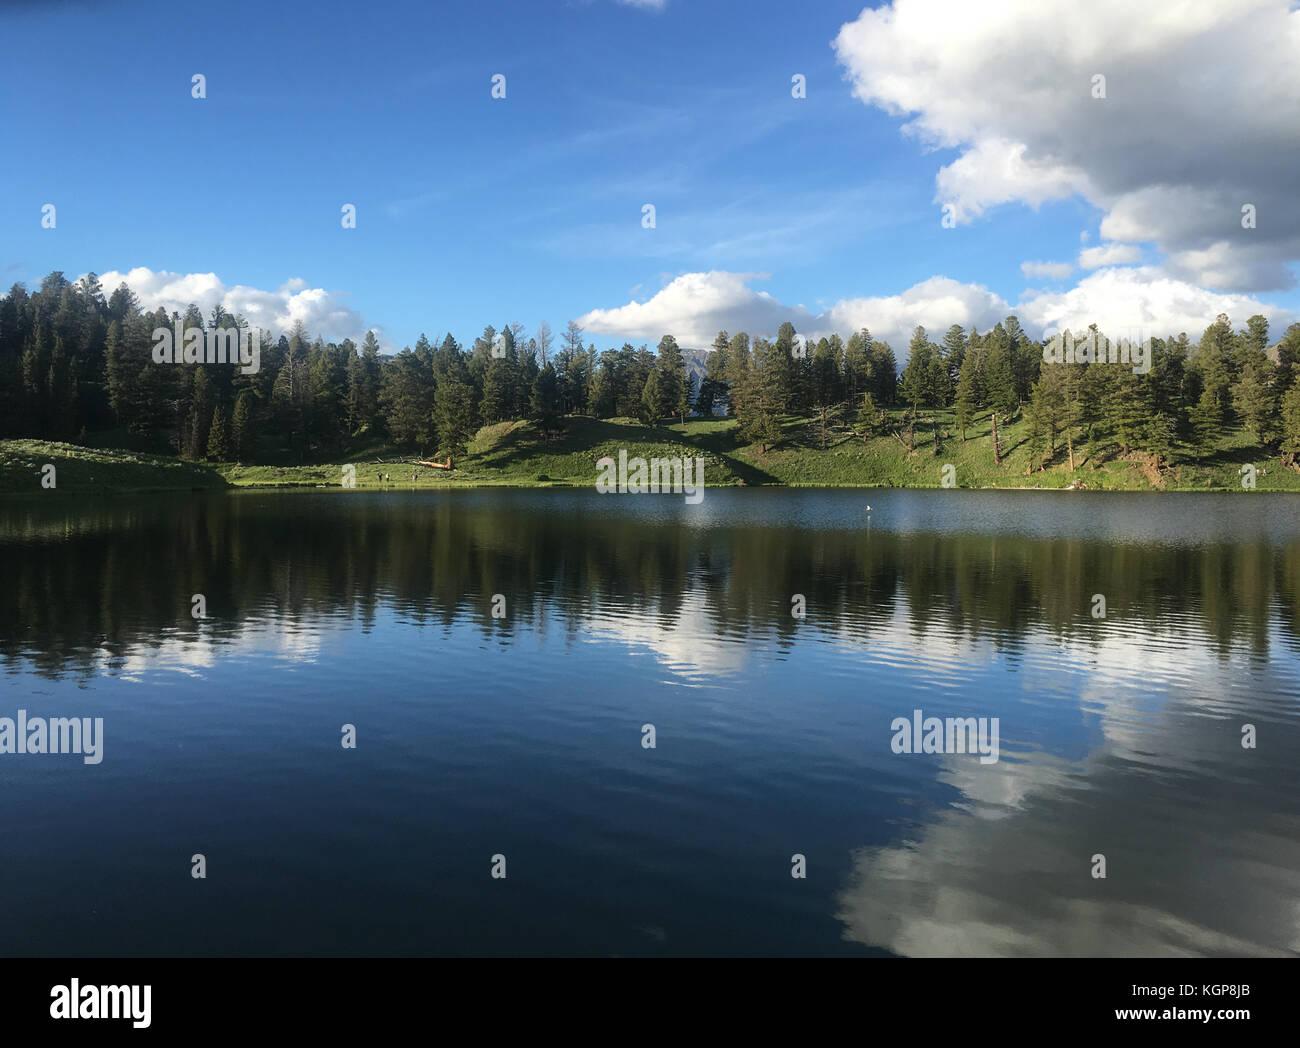 Trout Lake at Yellowstone National Park - Stock Image